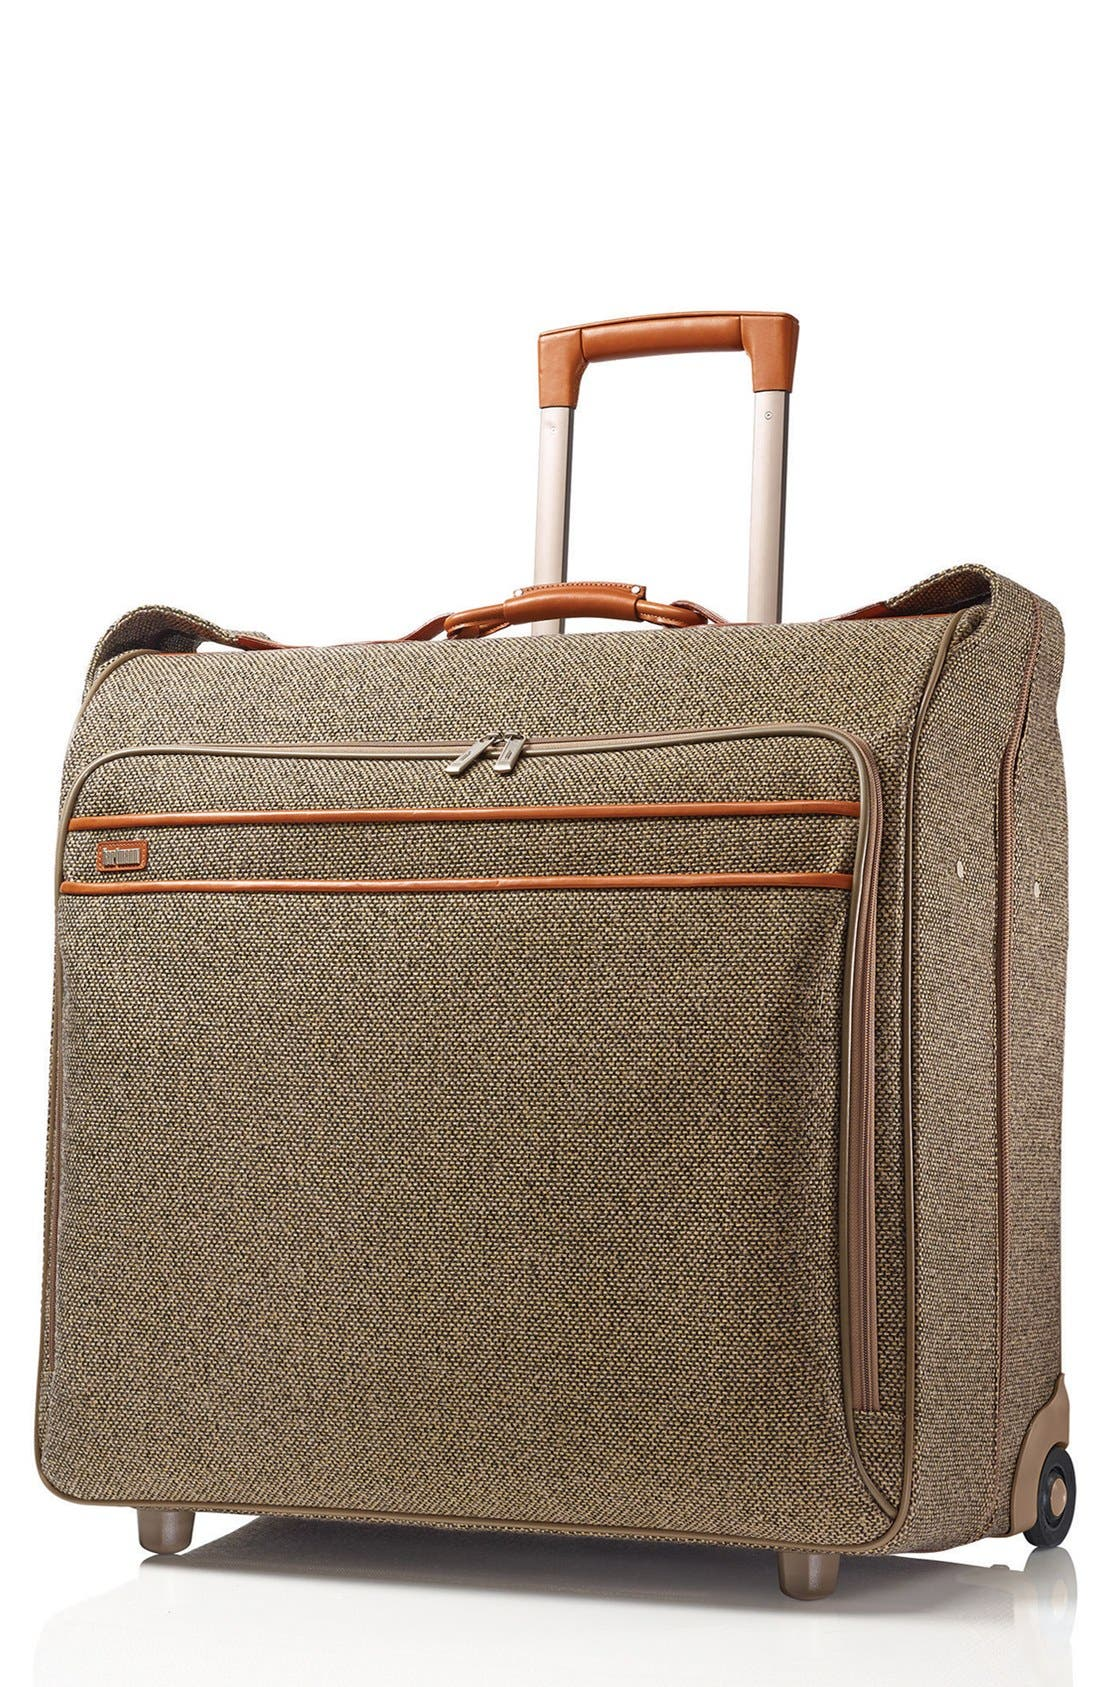 'Tweed Belting' Wheeled Garment Bag,                             Main thumbnail 1, color,                             217